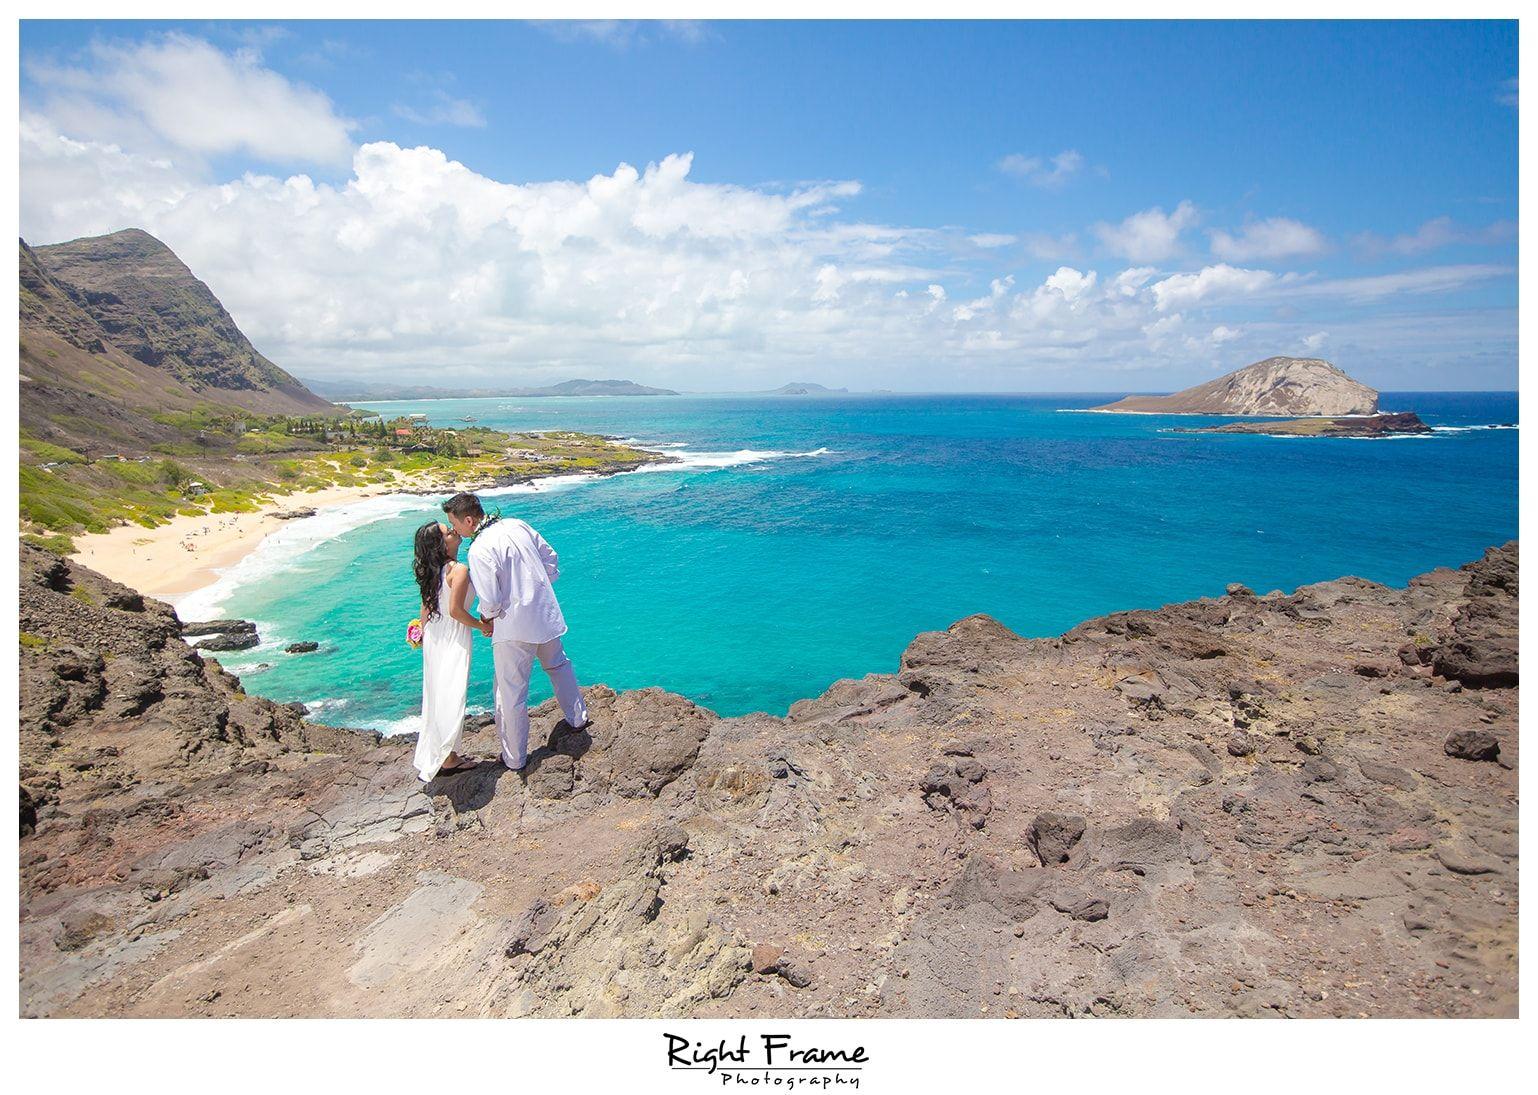 invitations wedding renewal vows ceremony%0A www rightframe net  Beautiful Destination Wedding Vow Renewal in Oahu   Hawaii